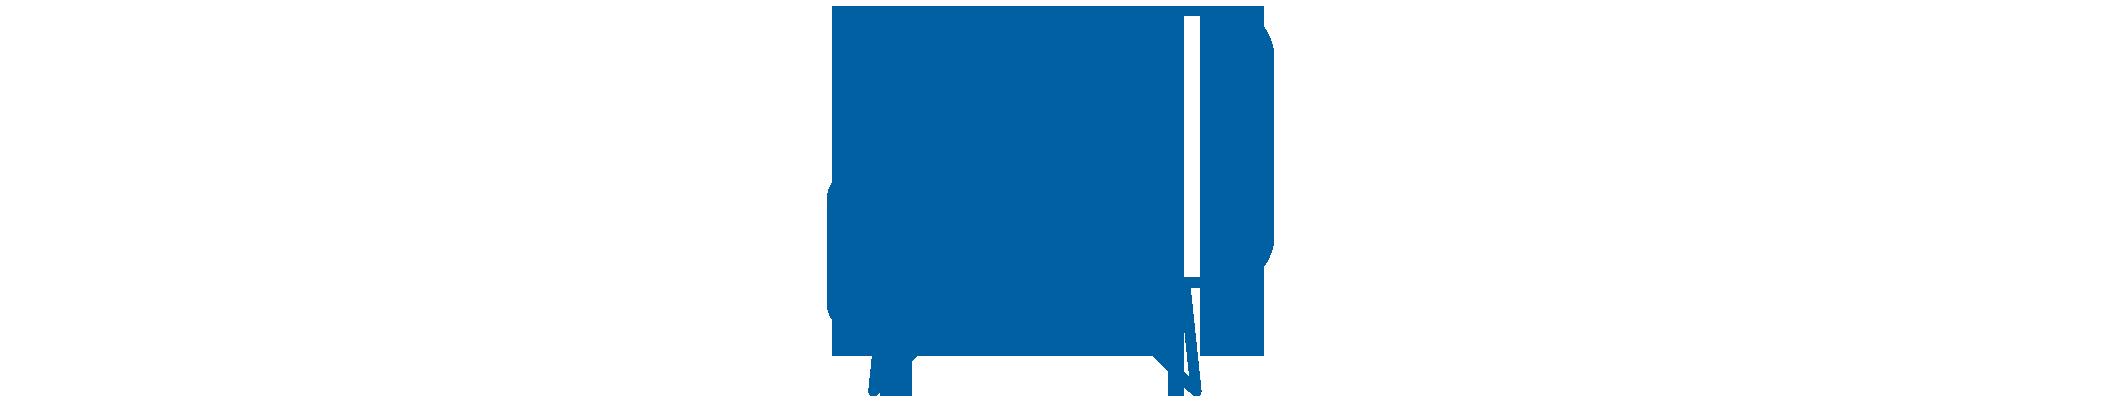 financement-icone